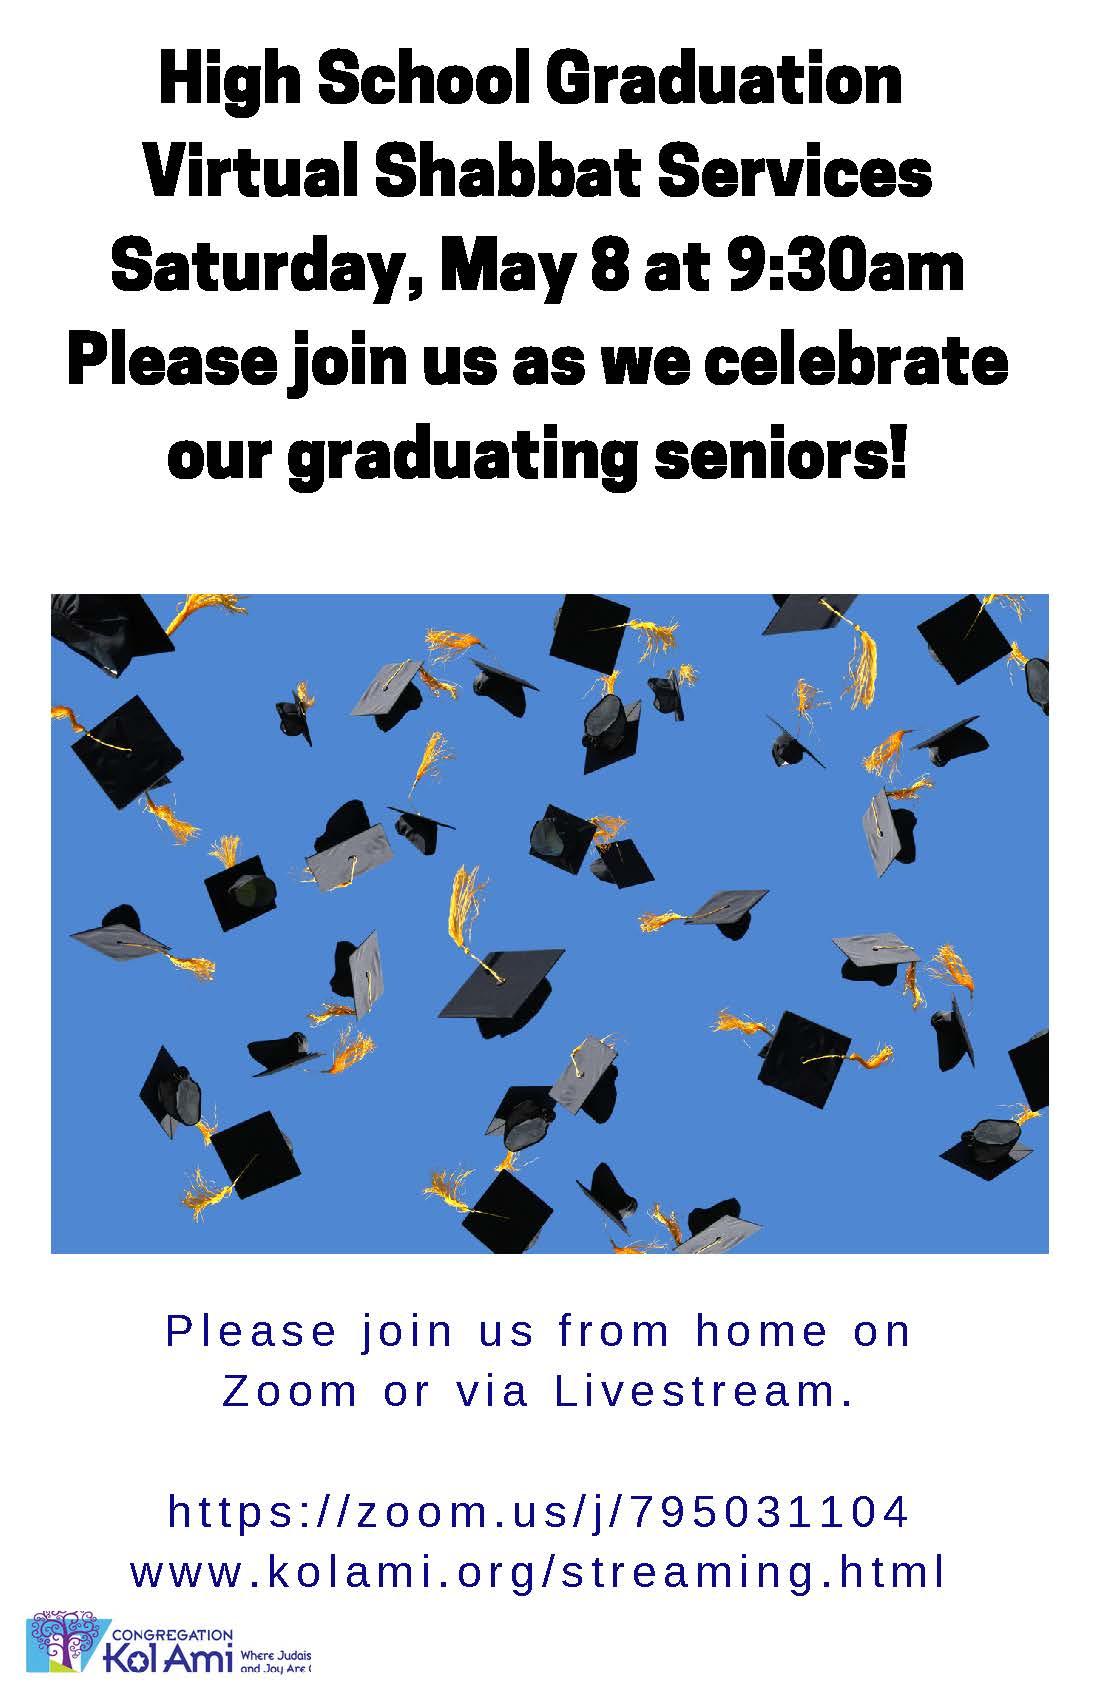 Banner Image for VIRTUAL SHABBAT SERVICES:  High School Graduation Recognition Shabbat